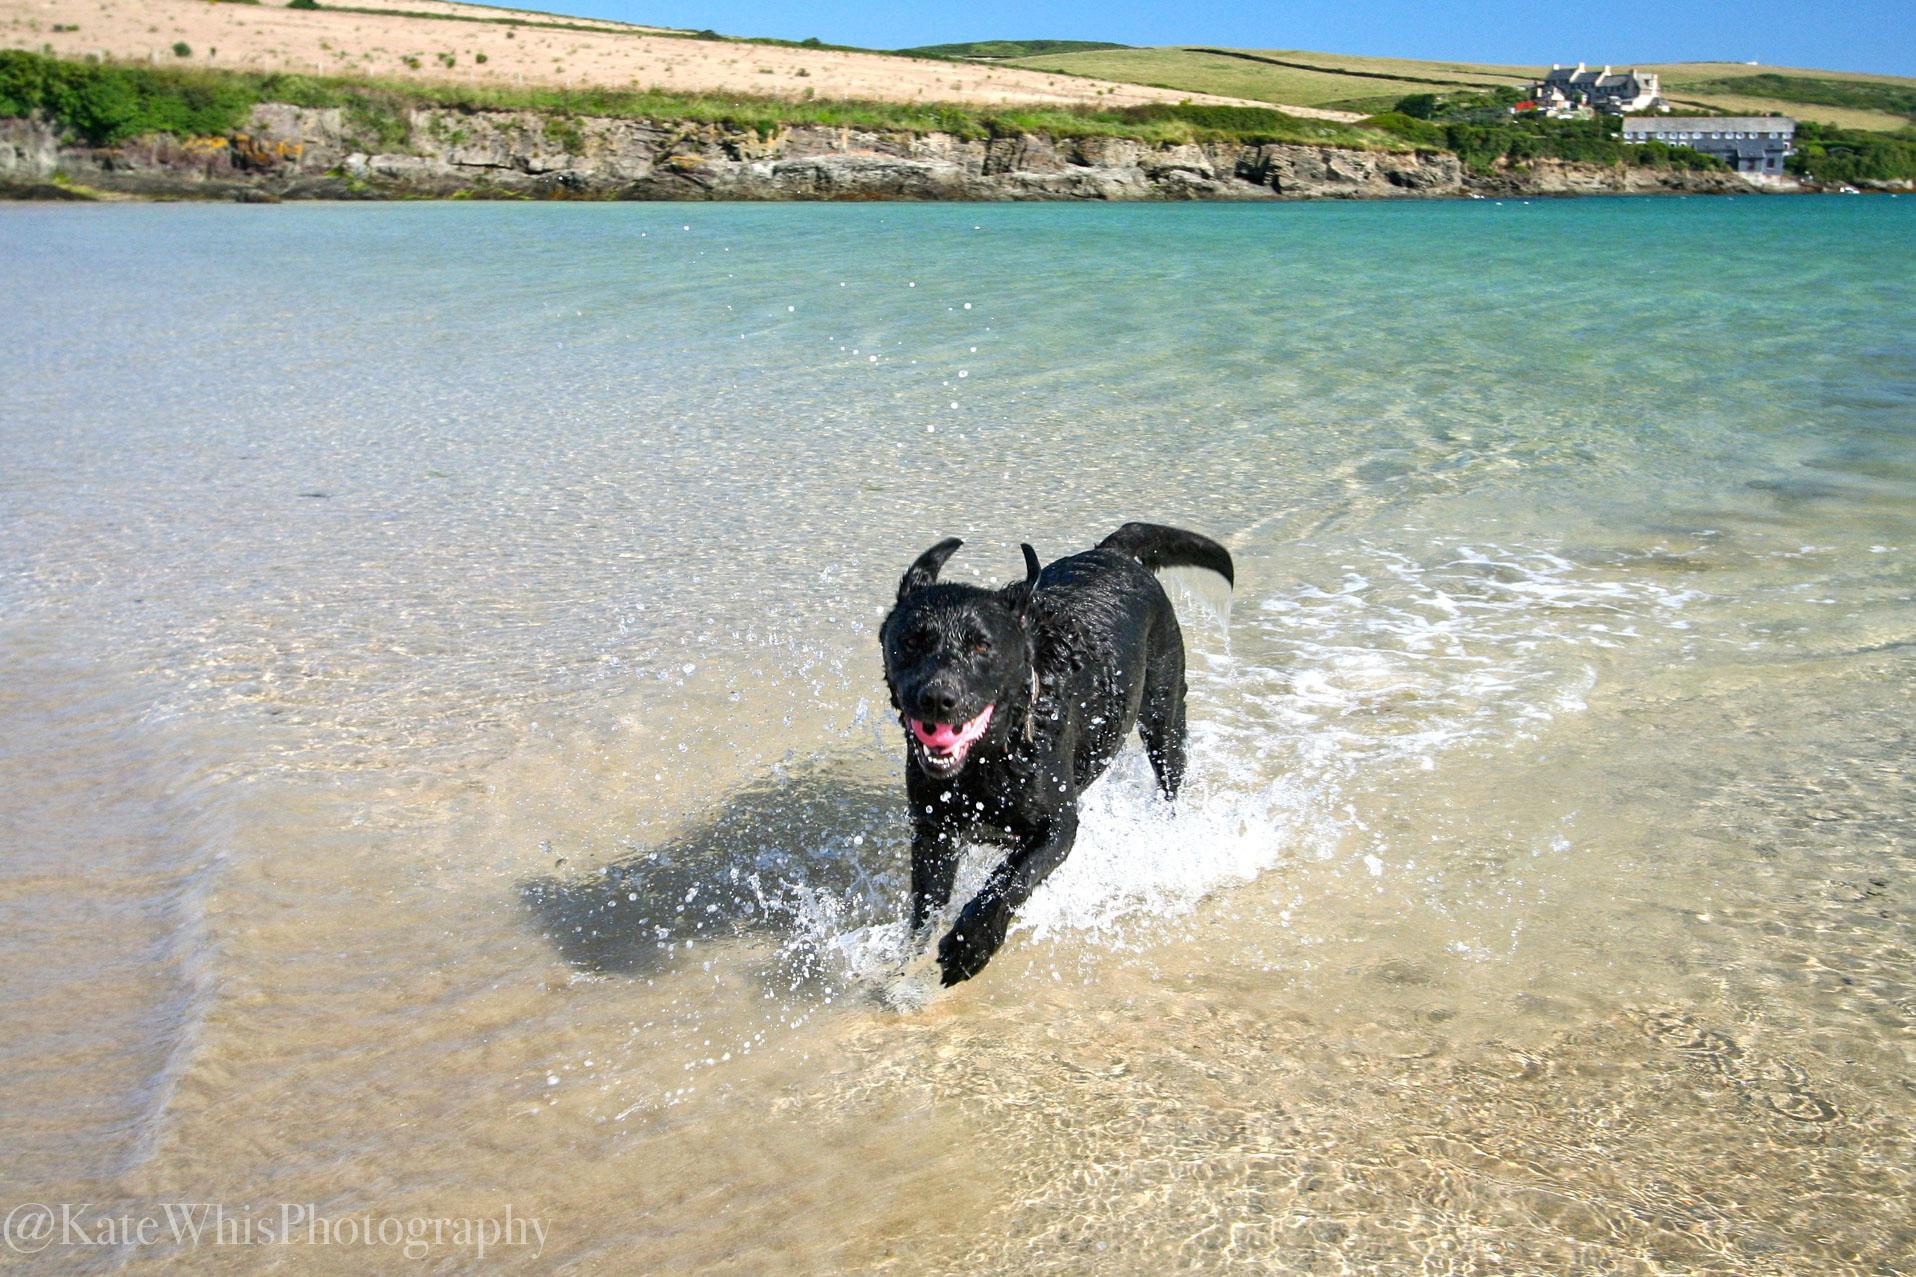 Dog in the sea at Tregirls